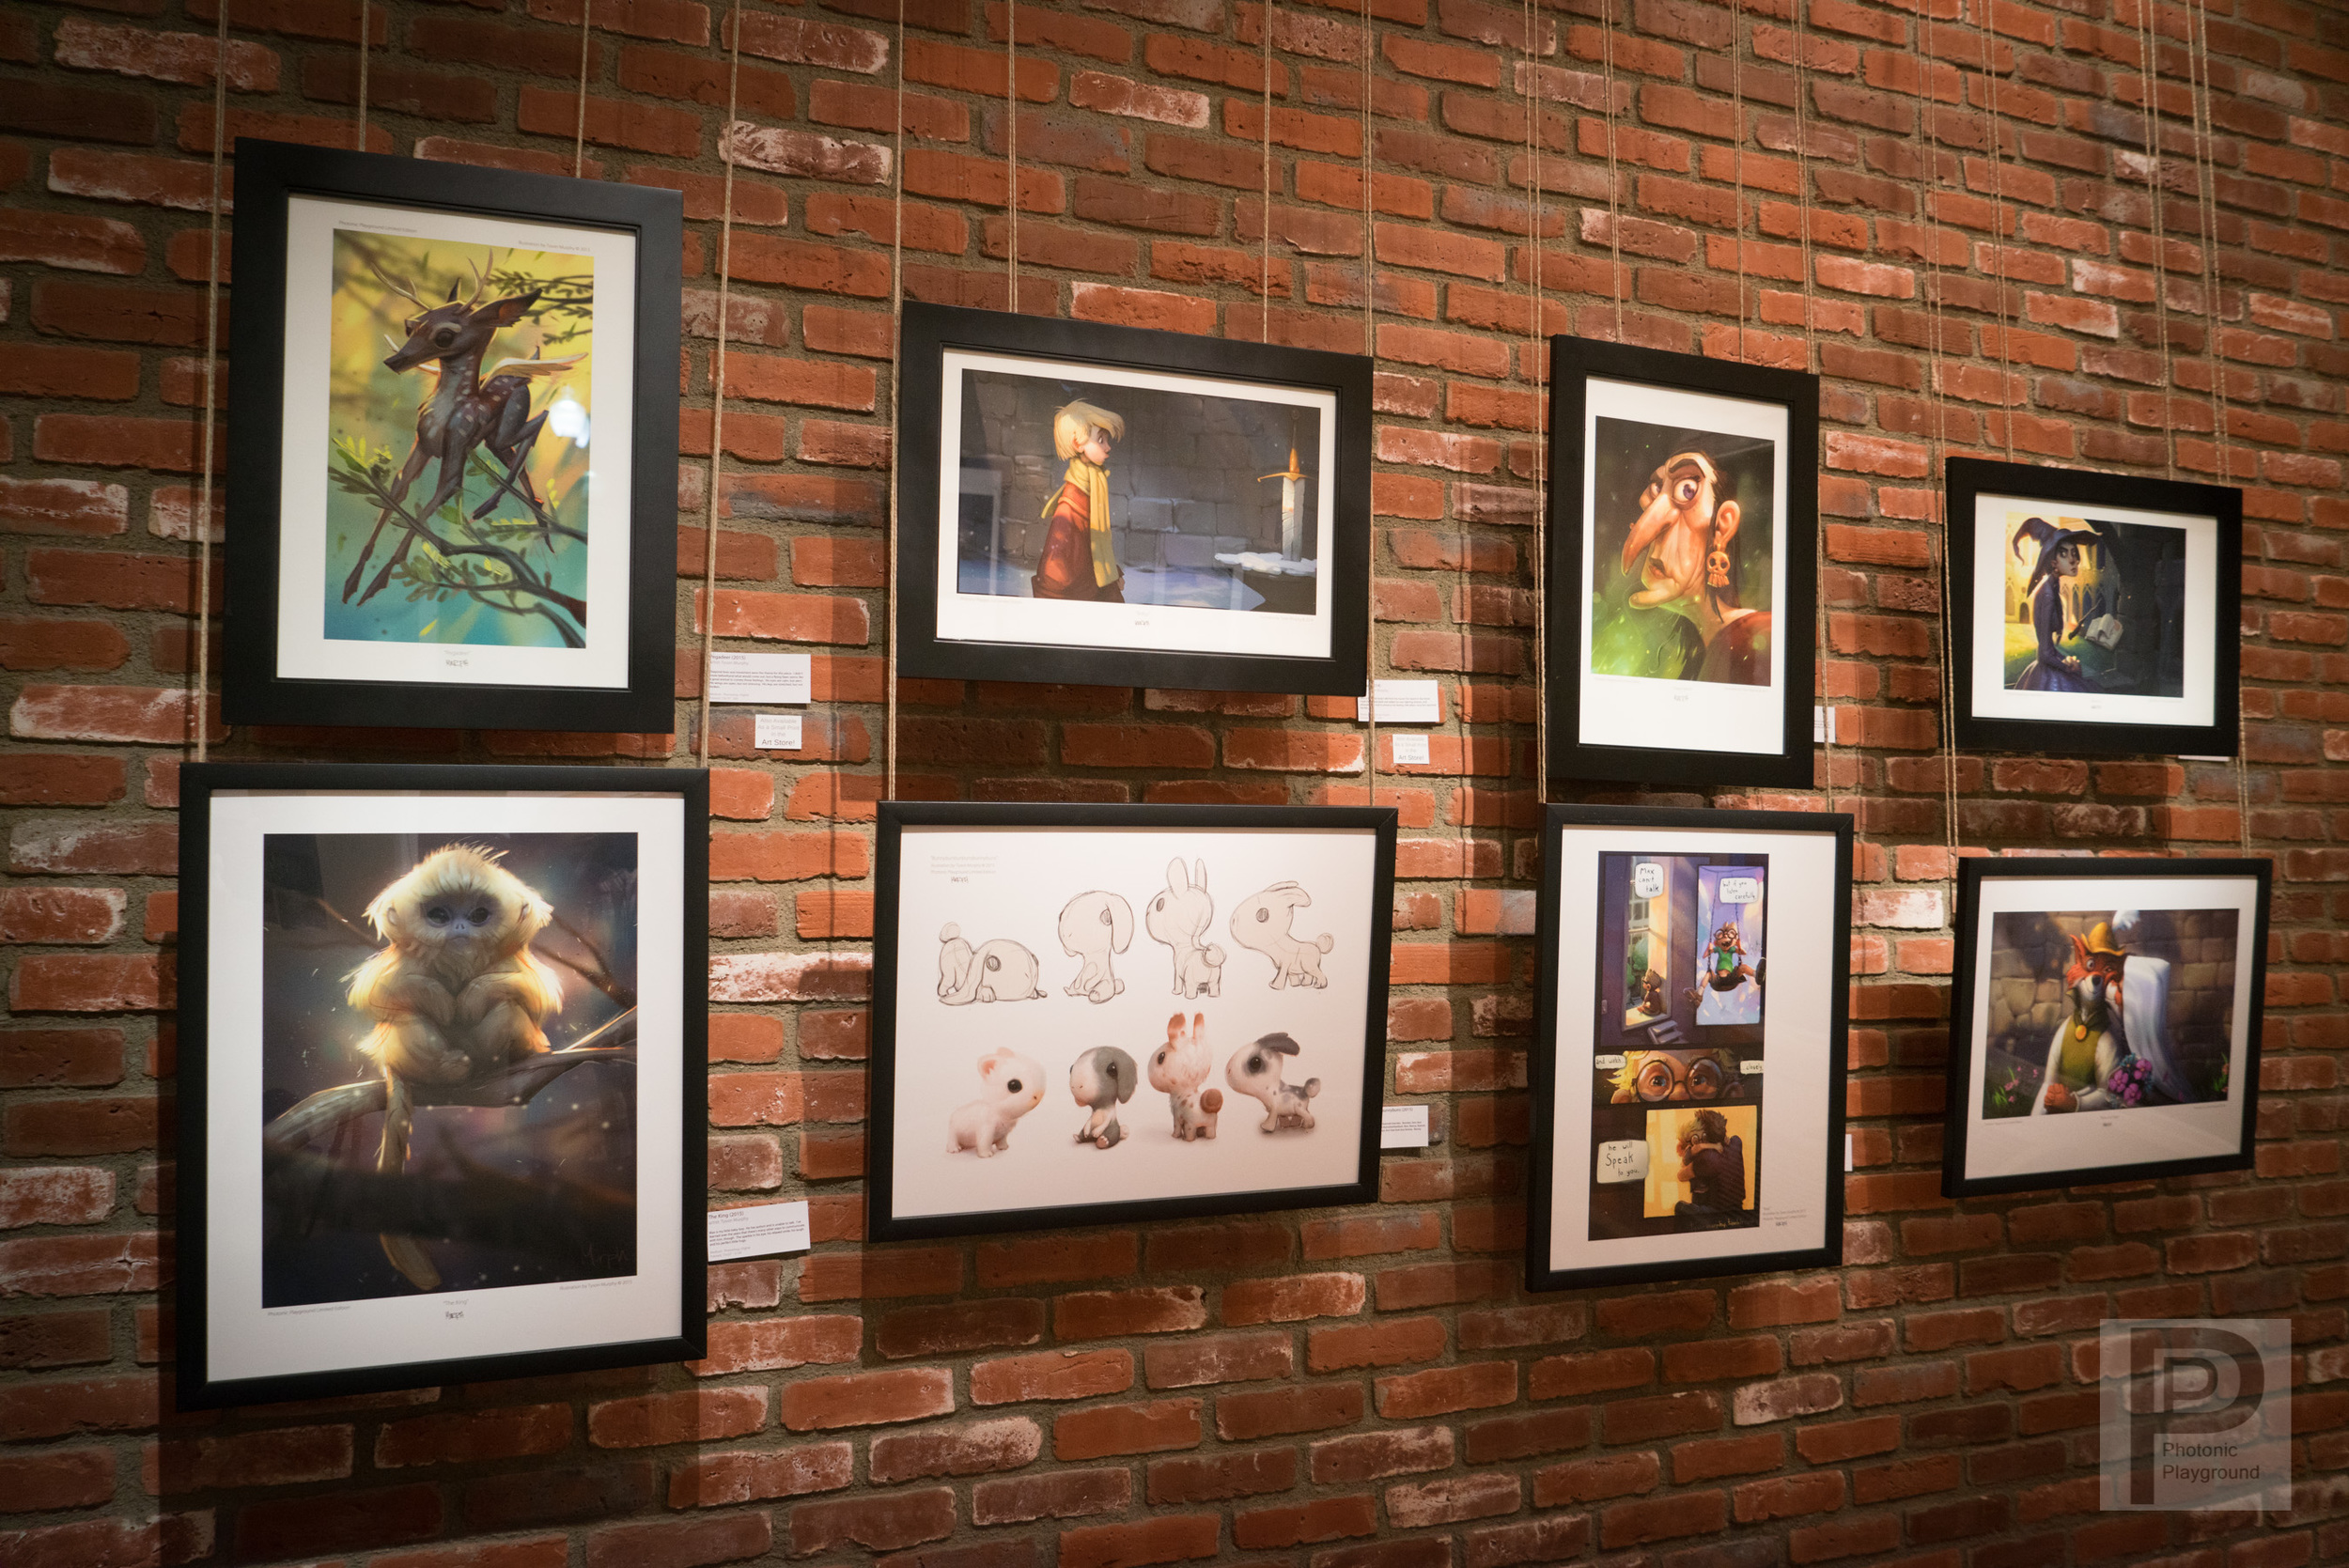 Gallery display of Tyson Murphy's art.